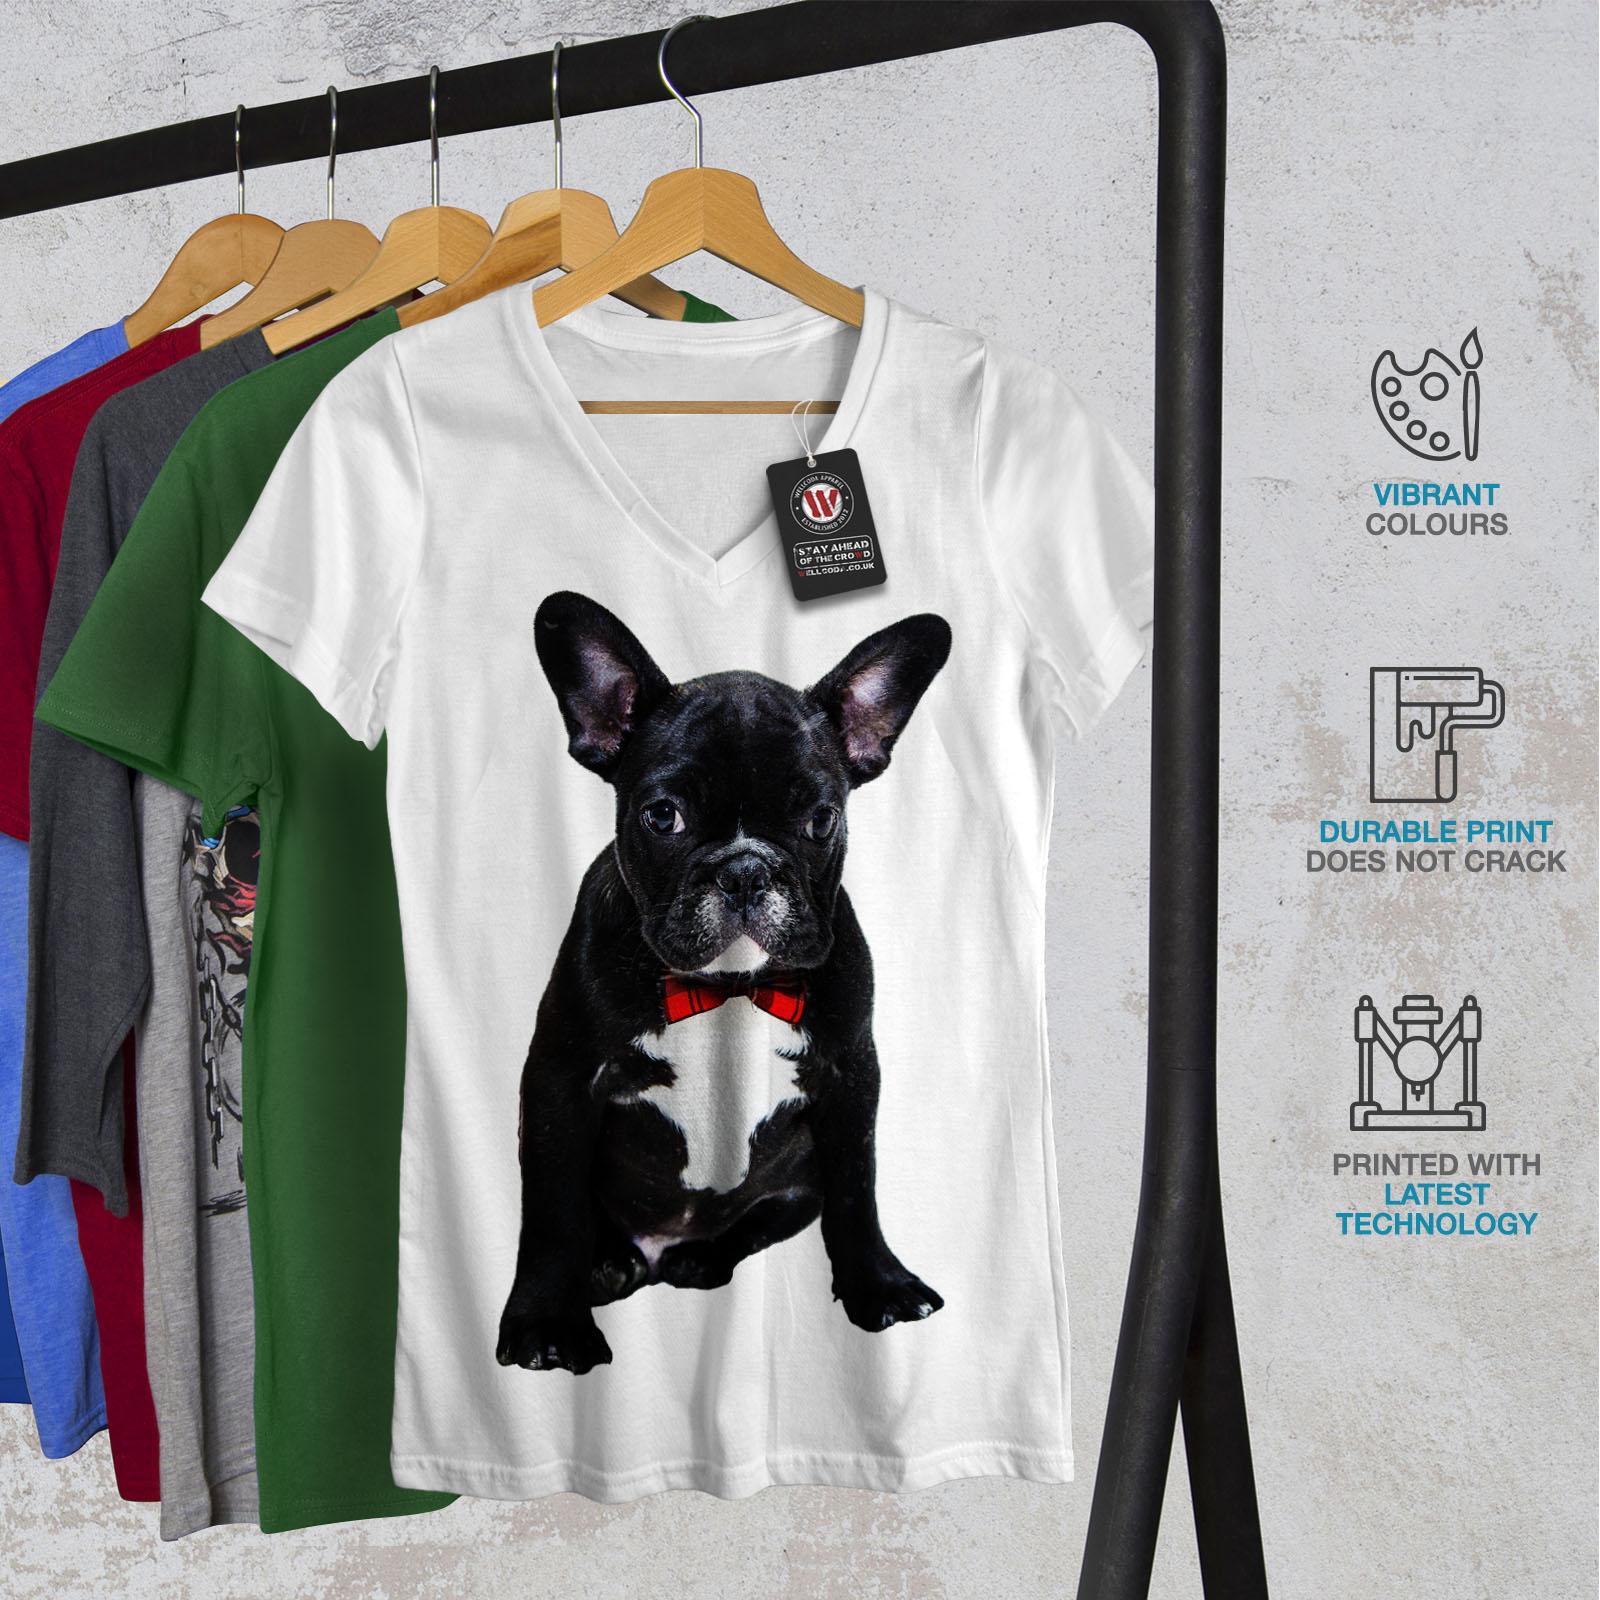 Wellcoda-Fancy-French-Bulldog-Womens-V-Neck-T-shirt-Black-Graphic-Design-Tee thumbnail 8